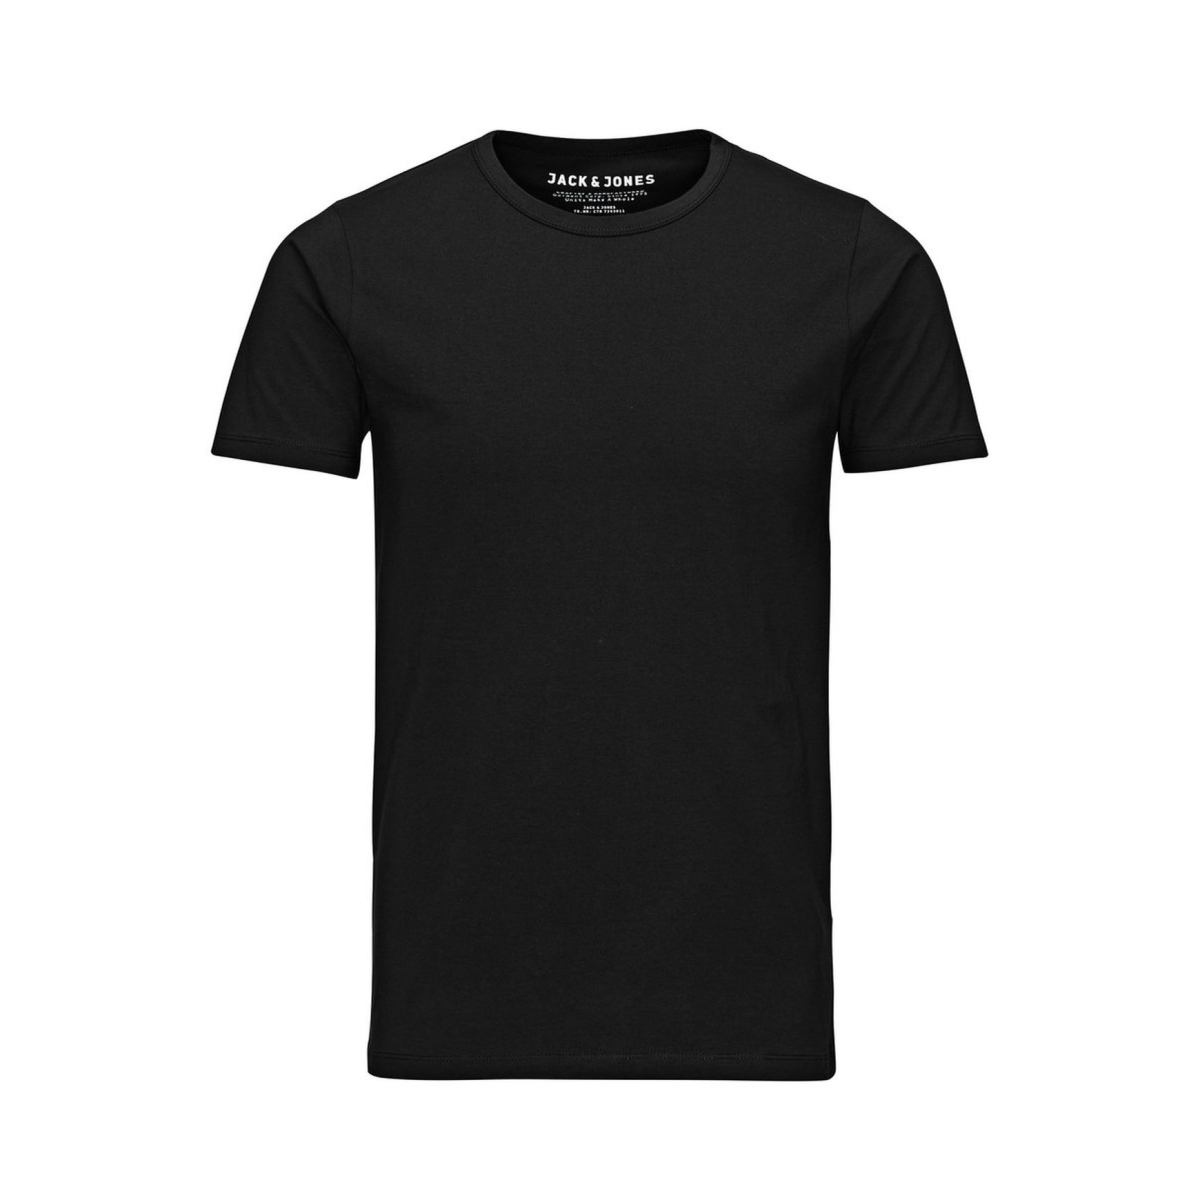 basic o-neck tee s/s 12058529 jack & jones t-shirt black